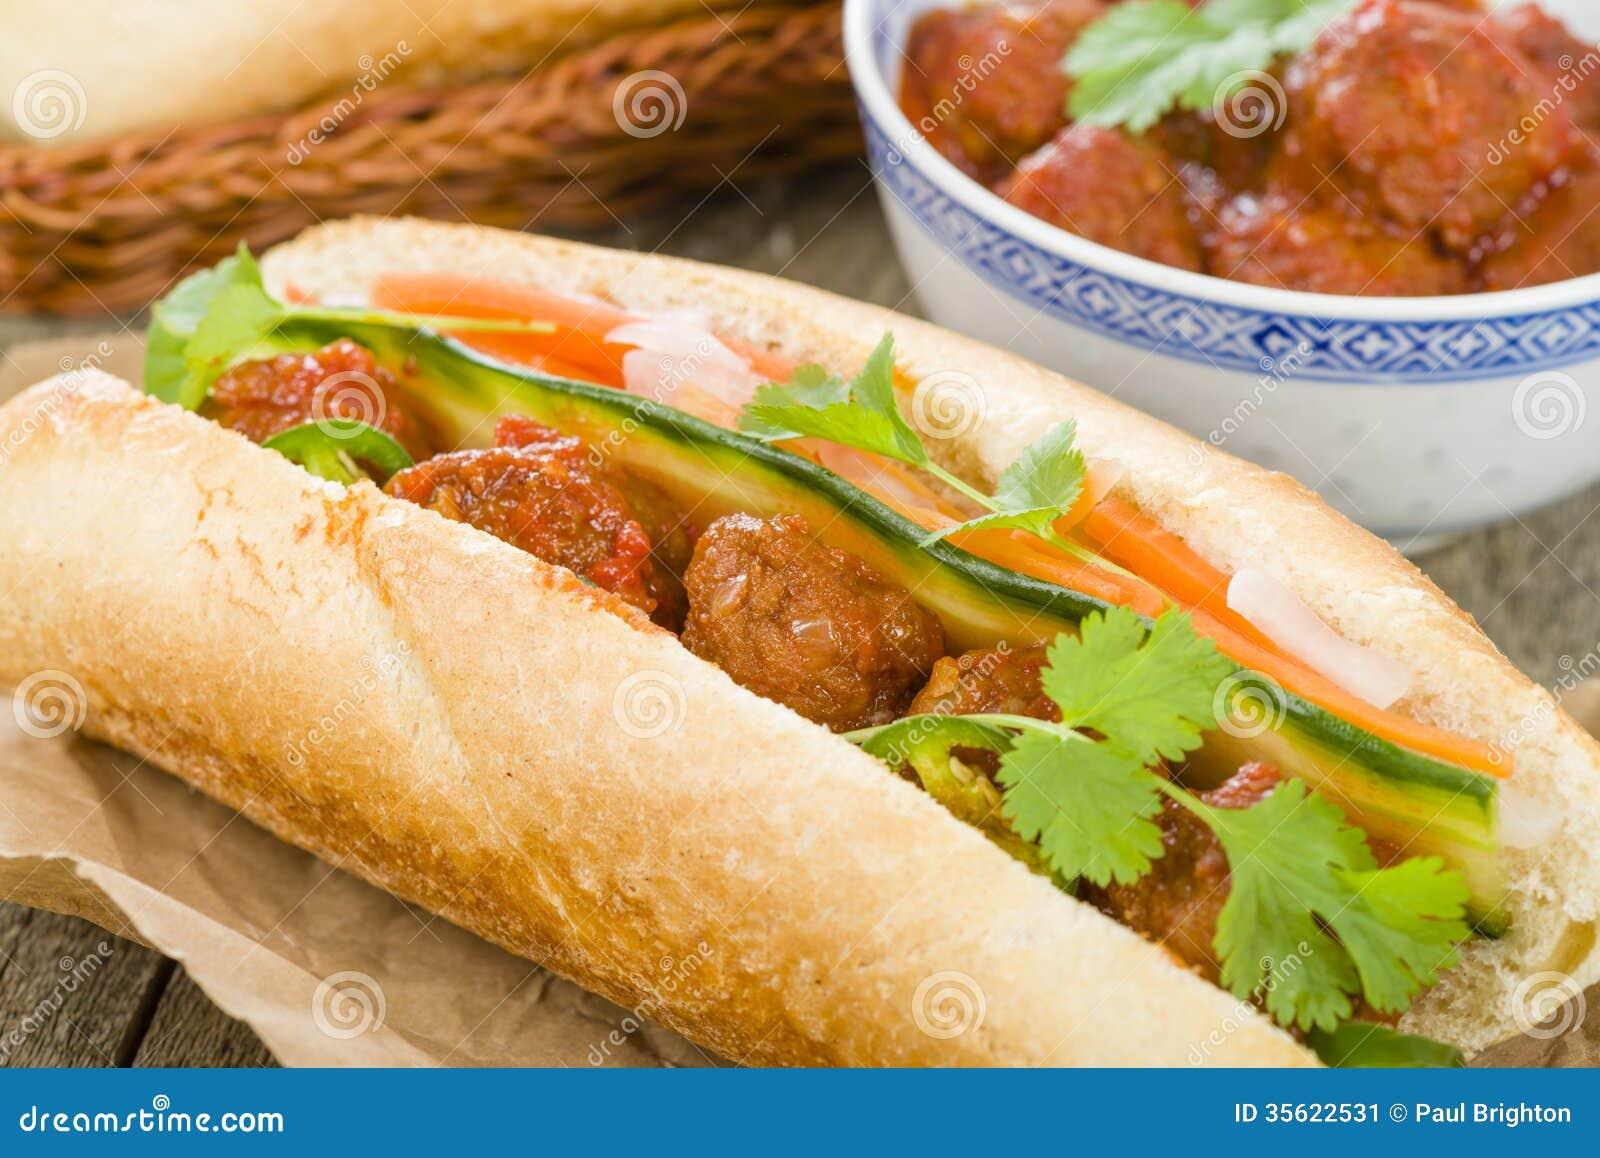 ... sauce, do chua (radish and carrot pickle), cucumber and coriander